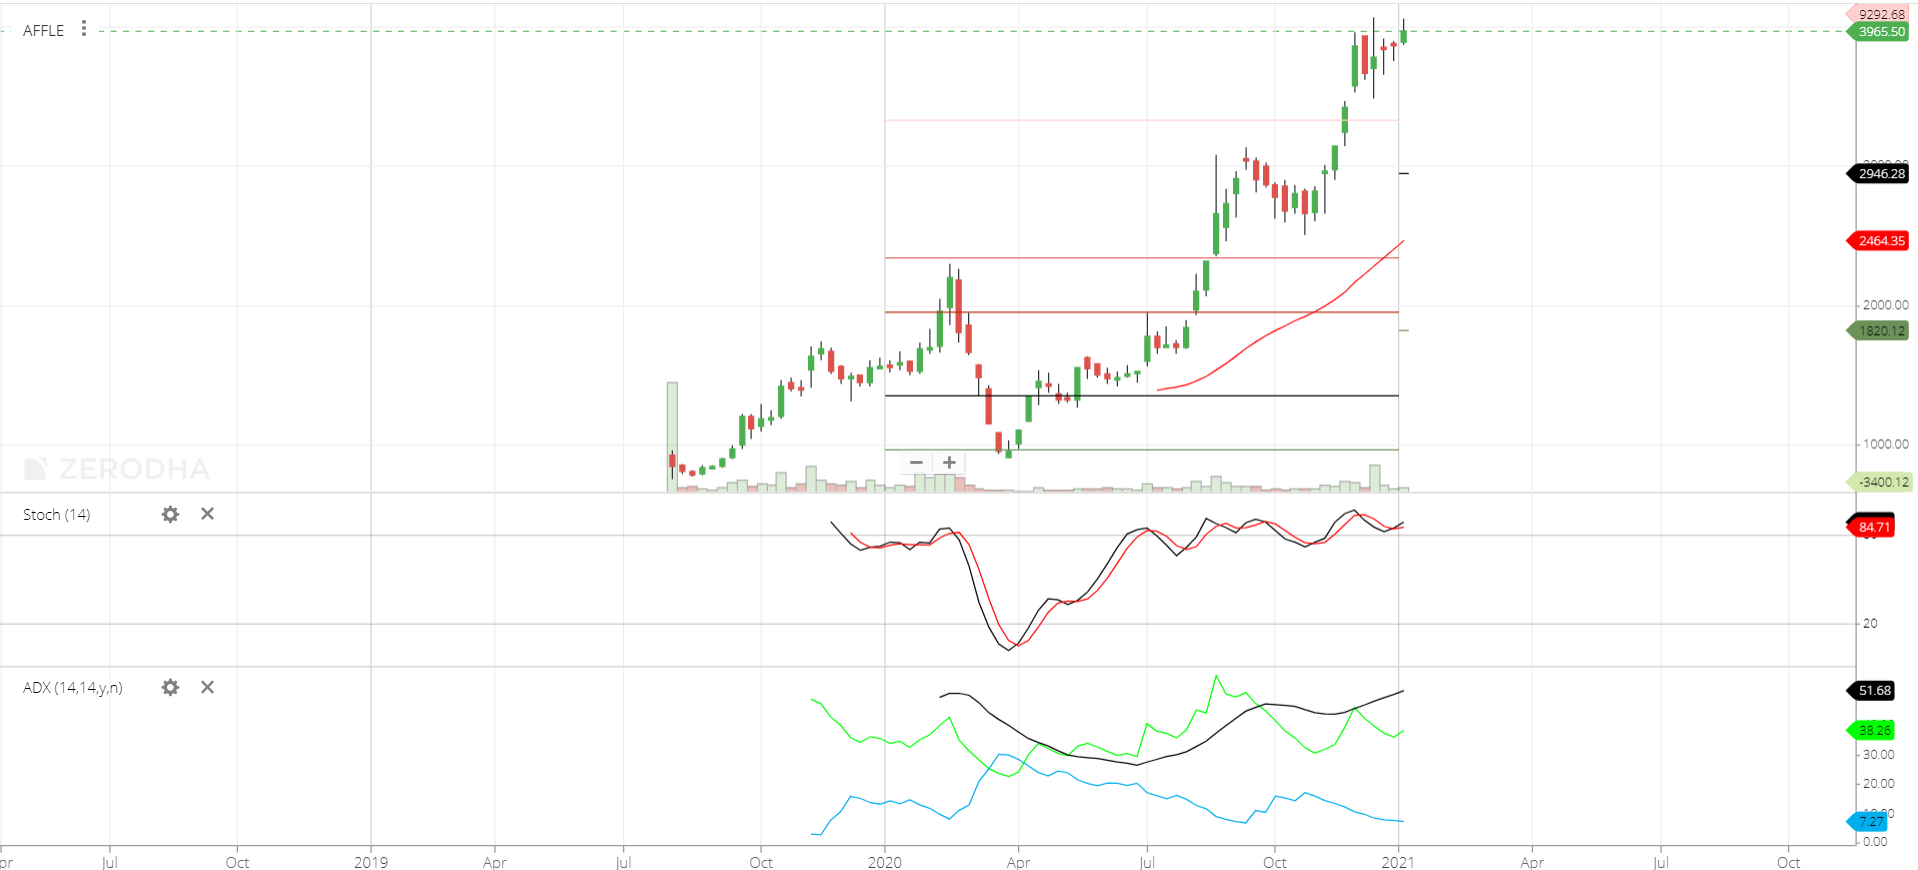 Affle share price